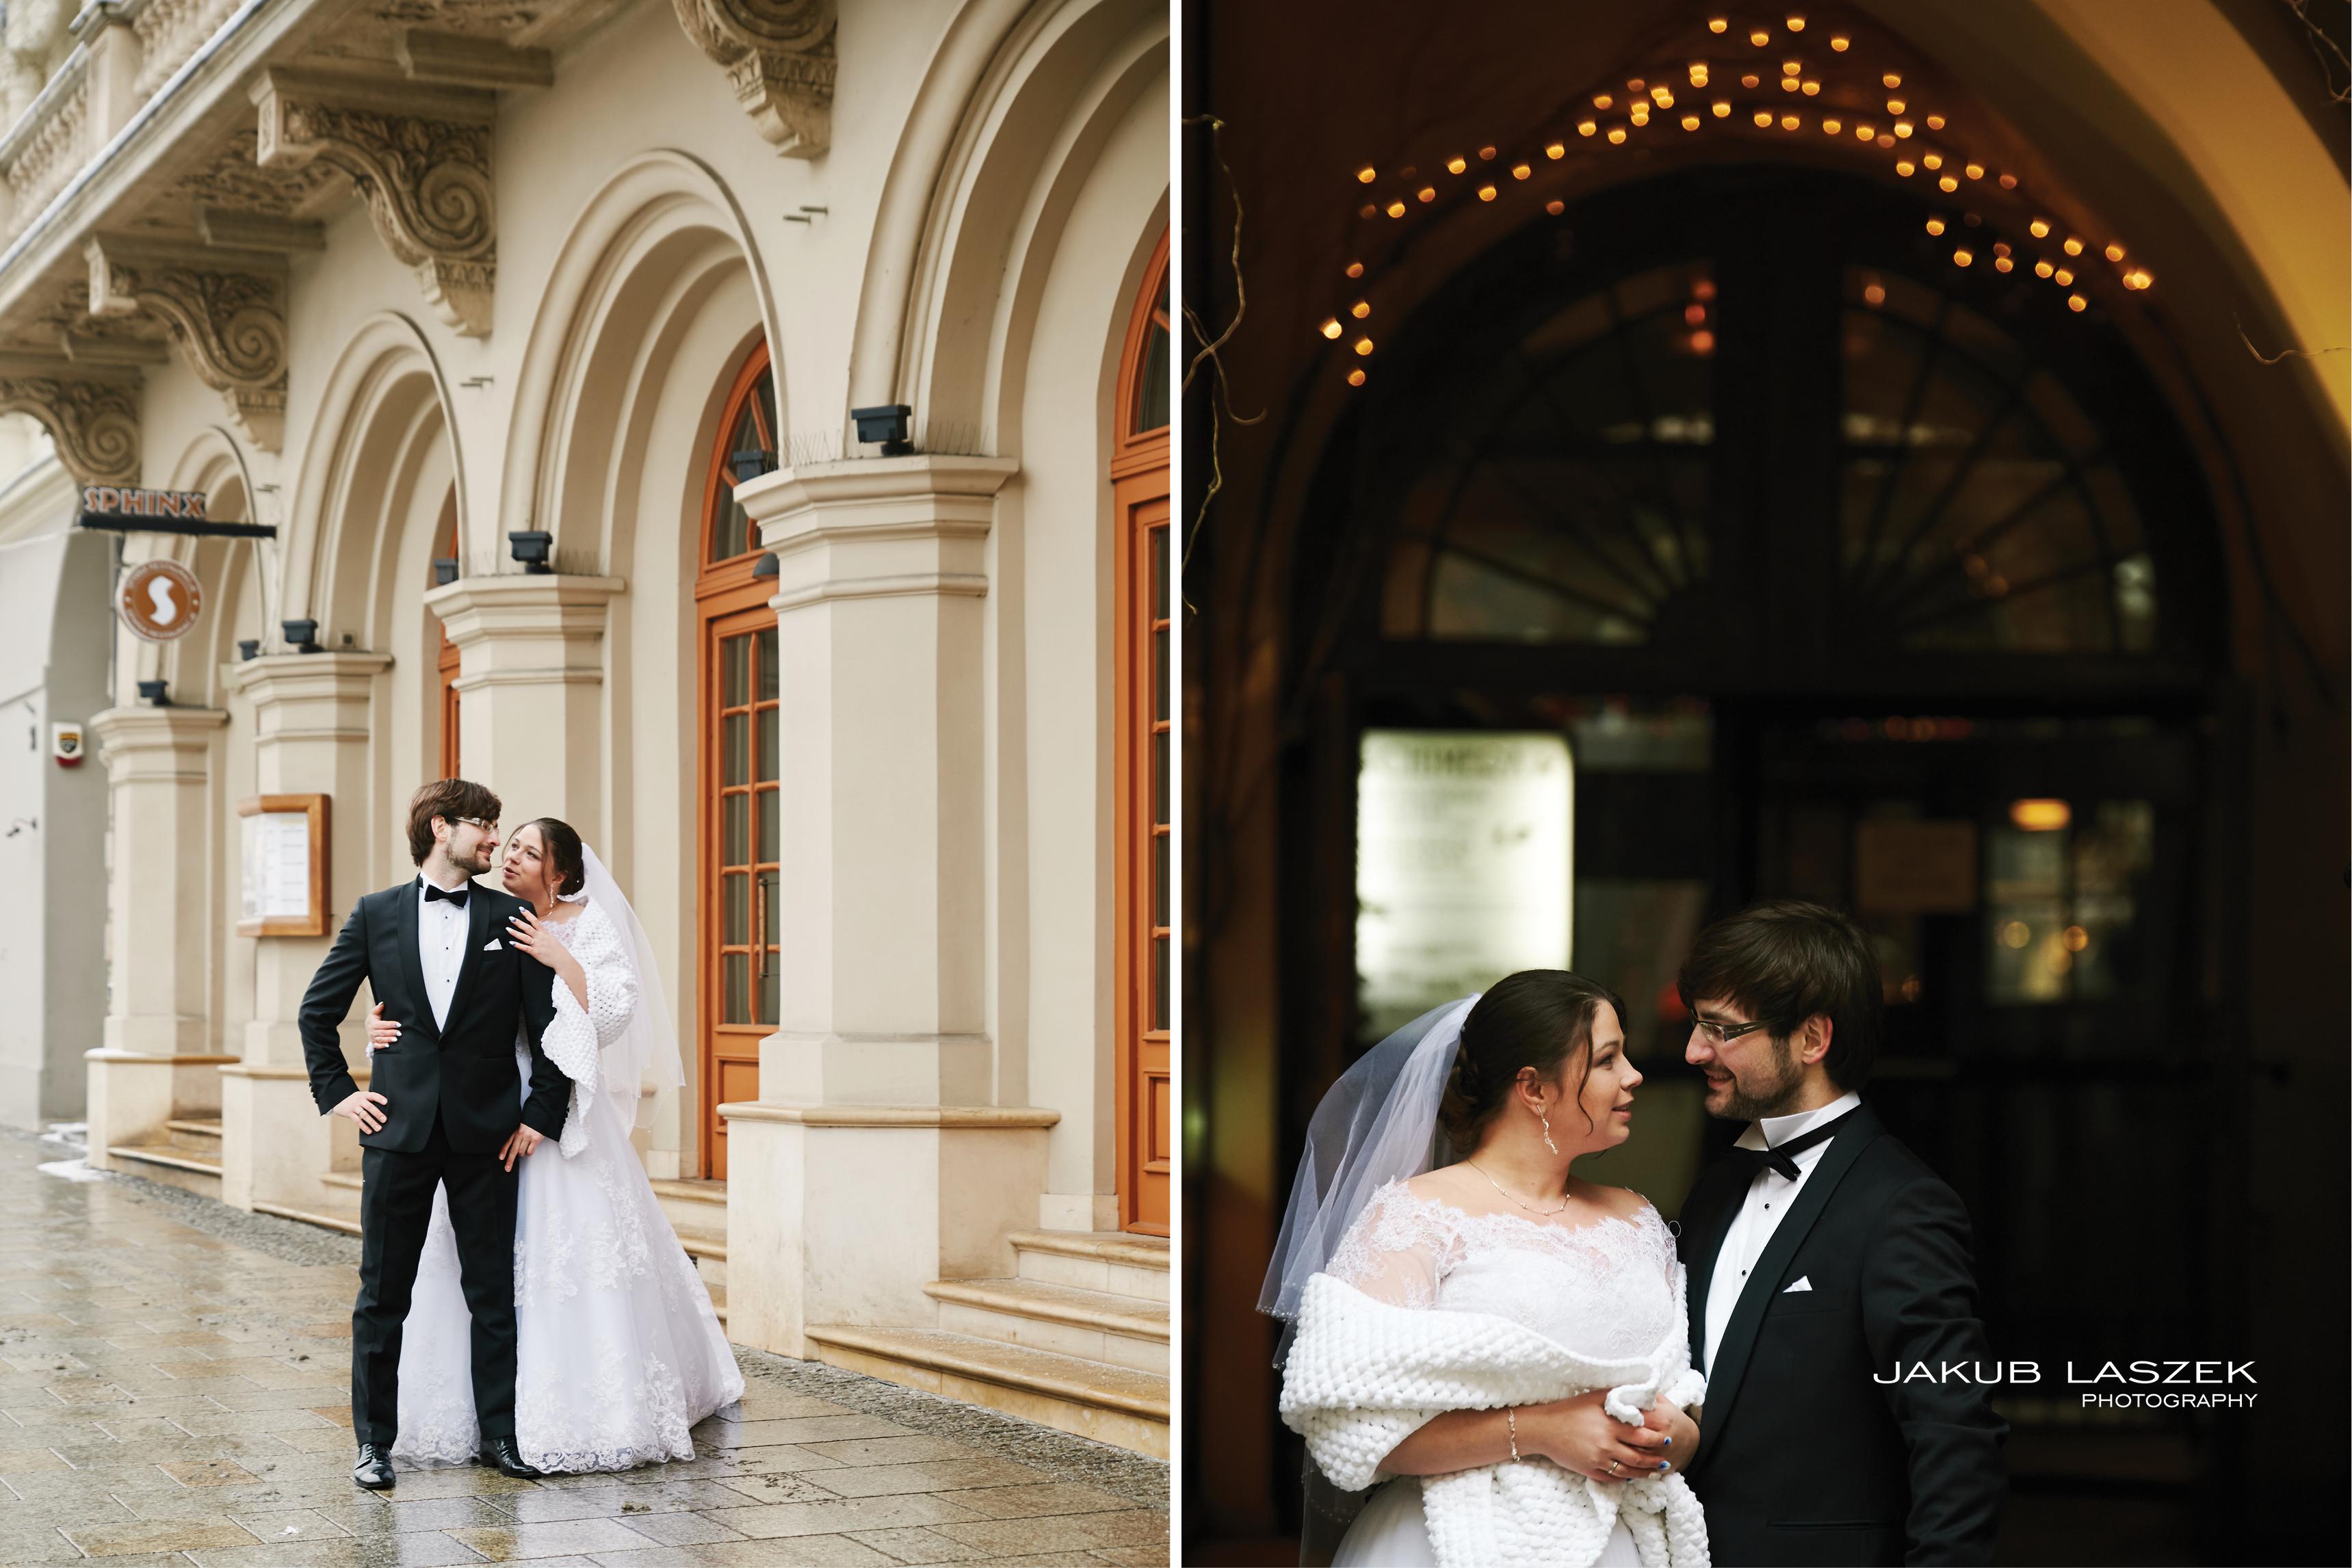 tarnow_fotograf_slubny_wedding_photographer50